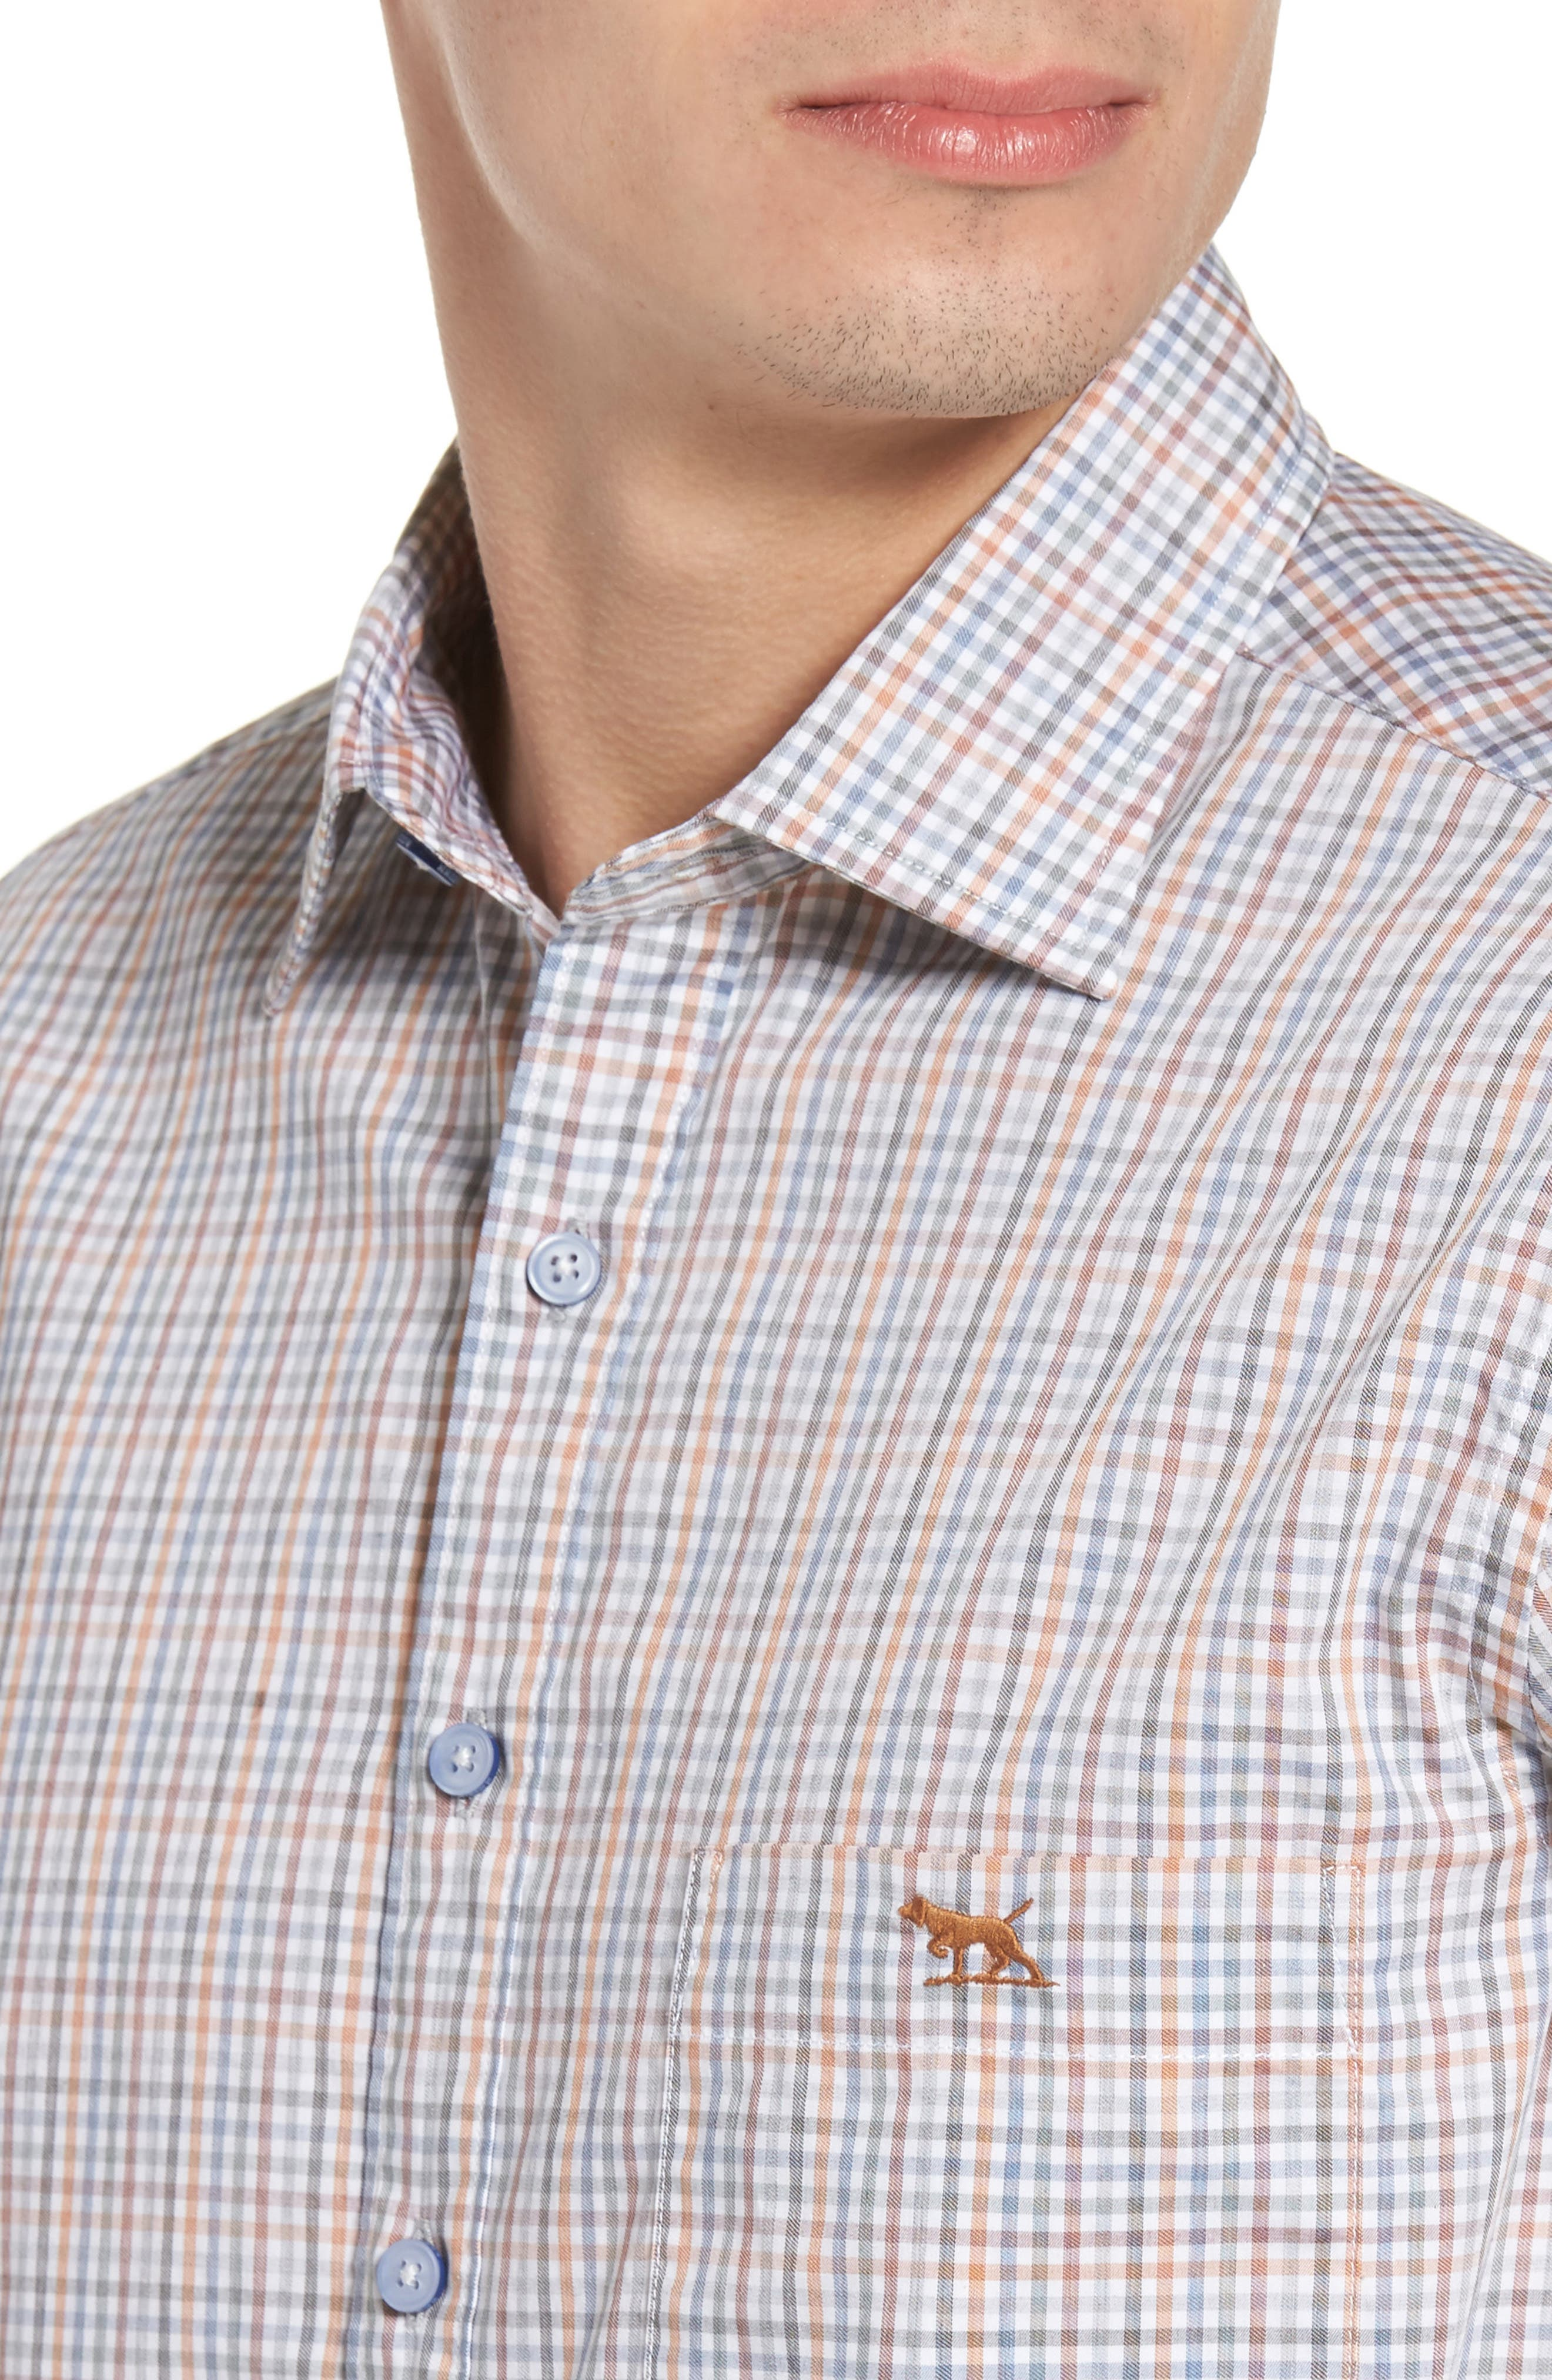 Woodlaw Original Fit Check Sport Shirt,                             Alternate thumbnail 7, color,